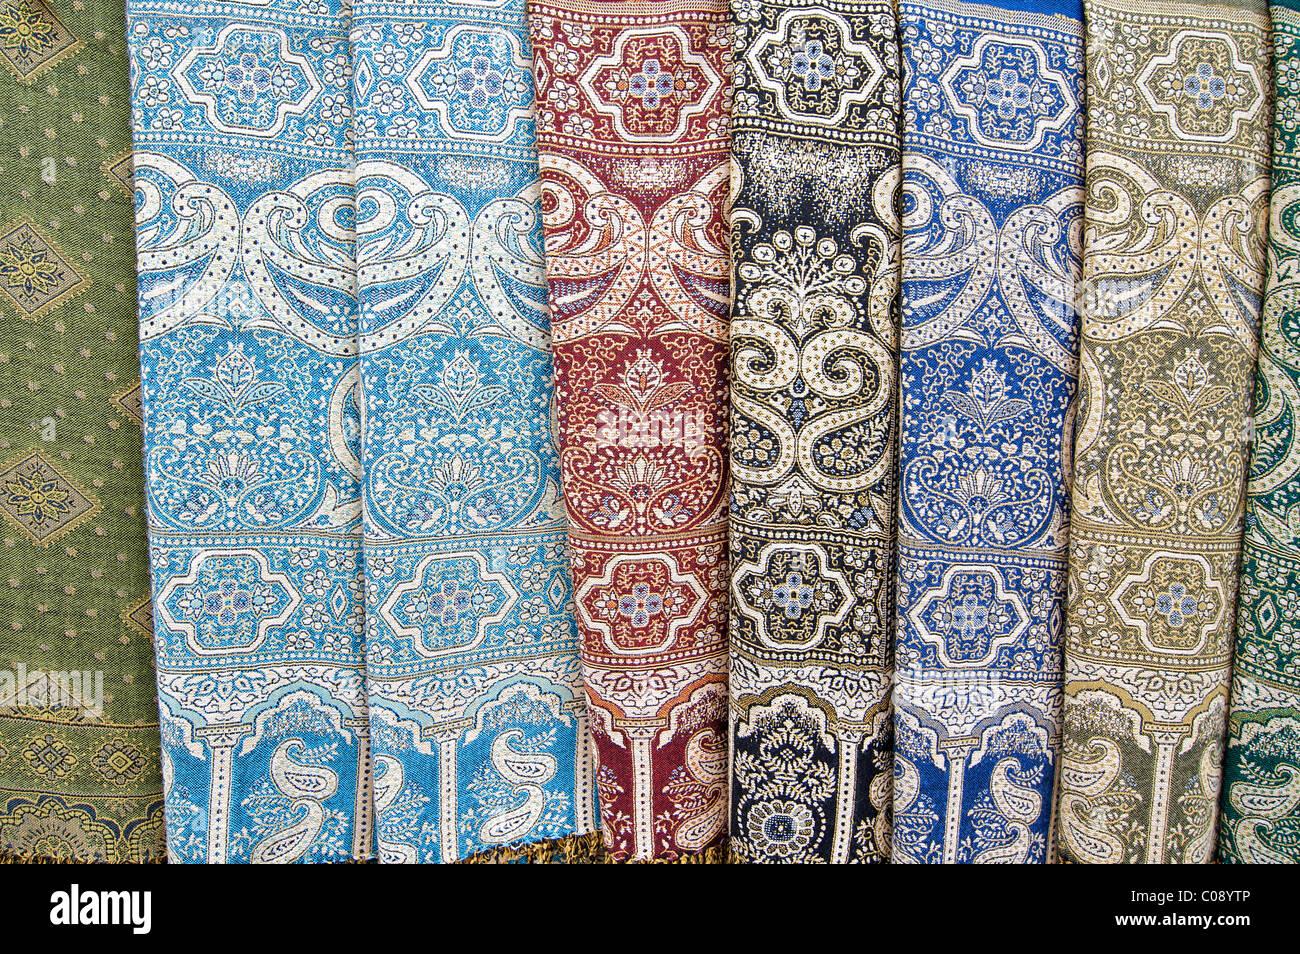 Woven fabric, Bukhara, Uzbekistan - Stock Image